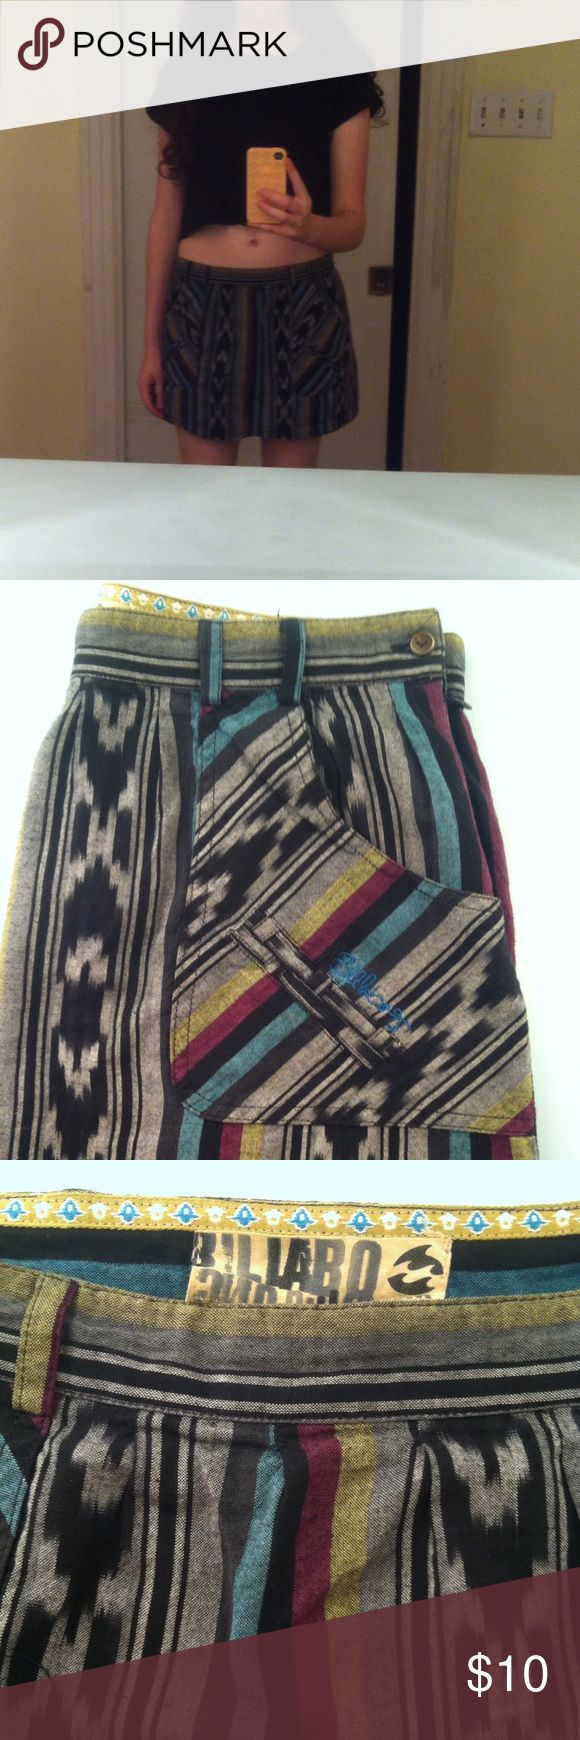 "Billabong Mini Skirt Lovely boho/Aztec print mini from Billabong. Used, like new. 13"" long. 100% cotton Billabong Skirts Mini"